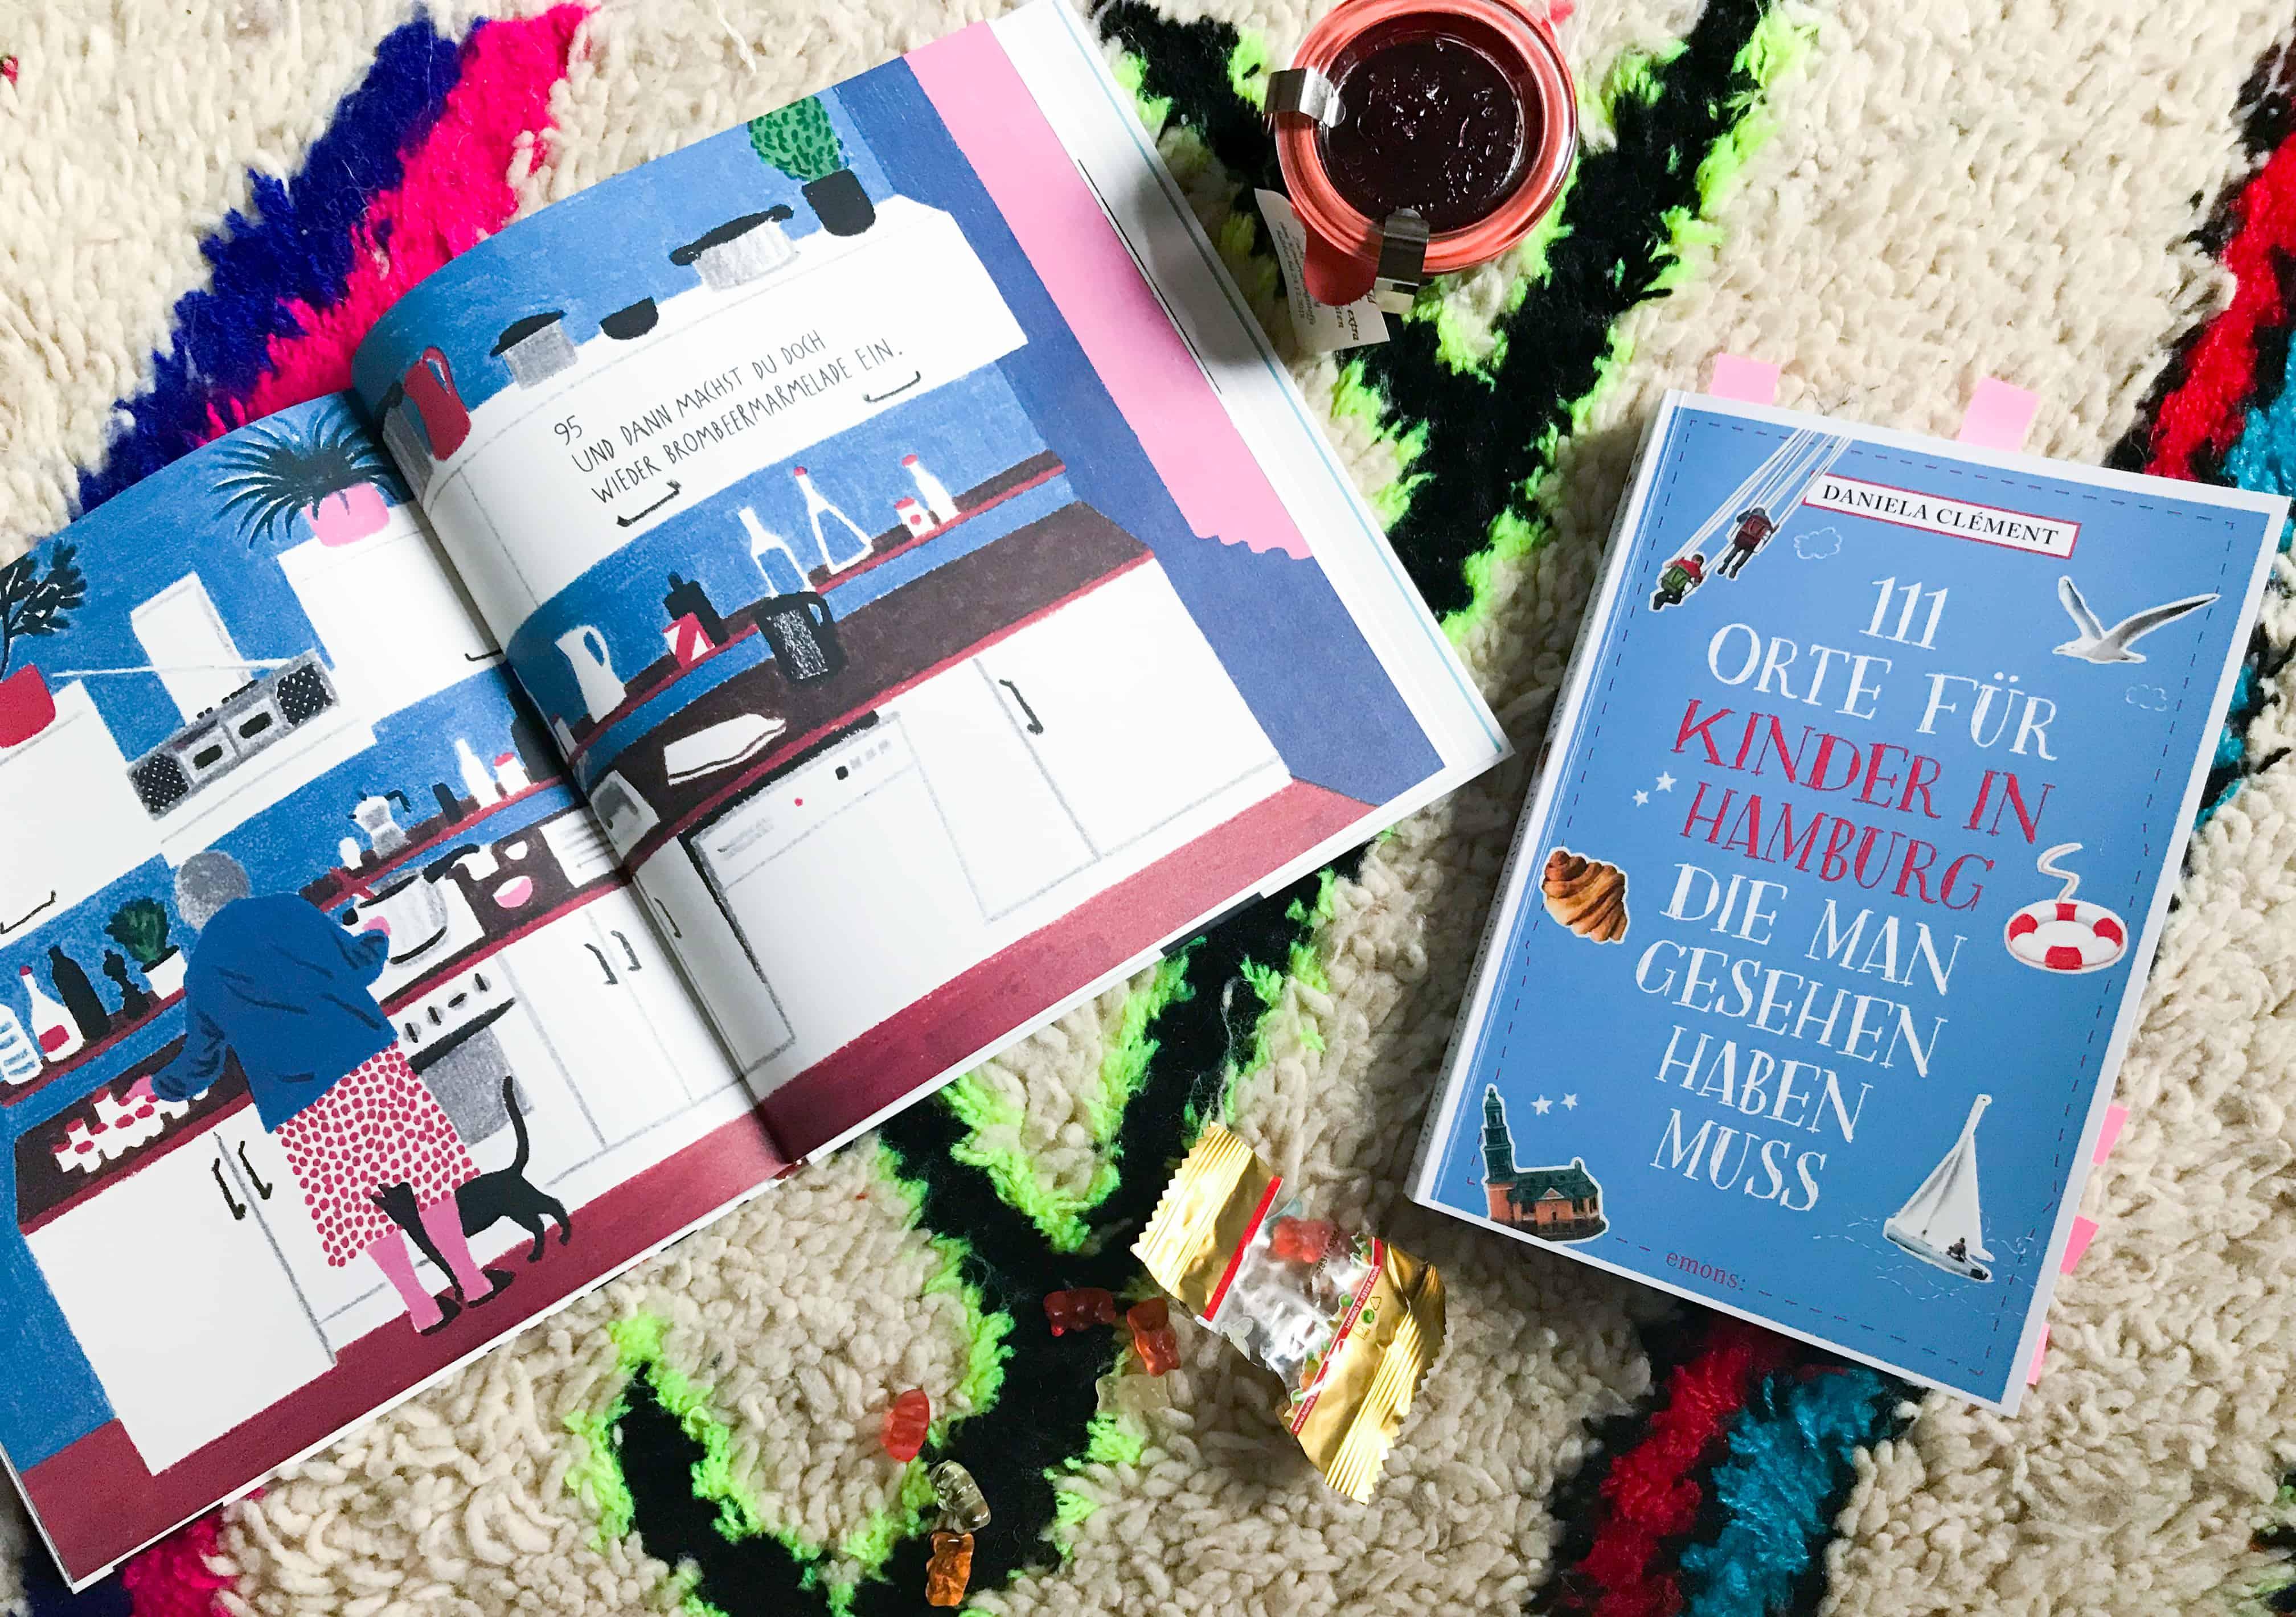 Outdoorküche Buch Buchung : Ohhhu2026 mhhhu2026 page 14